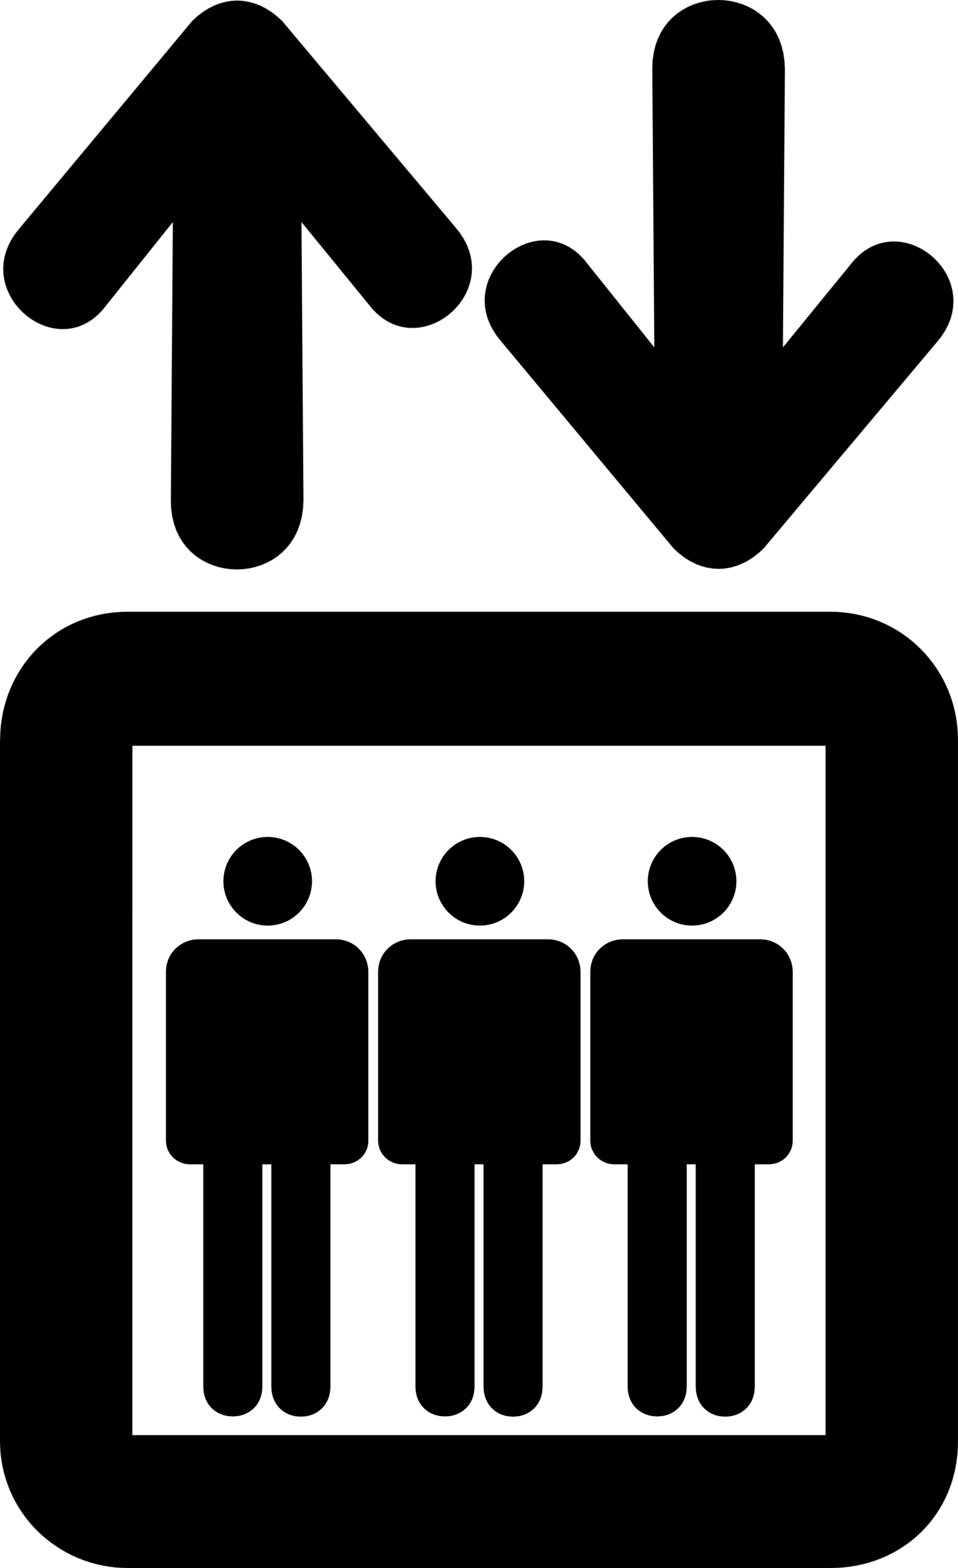 elevator clipart line art